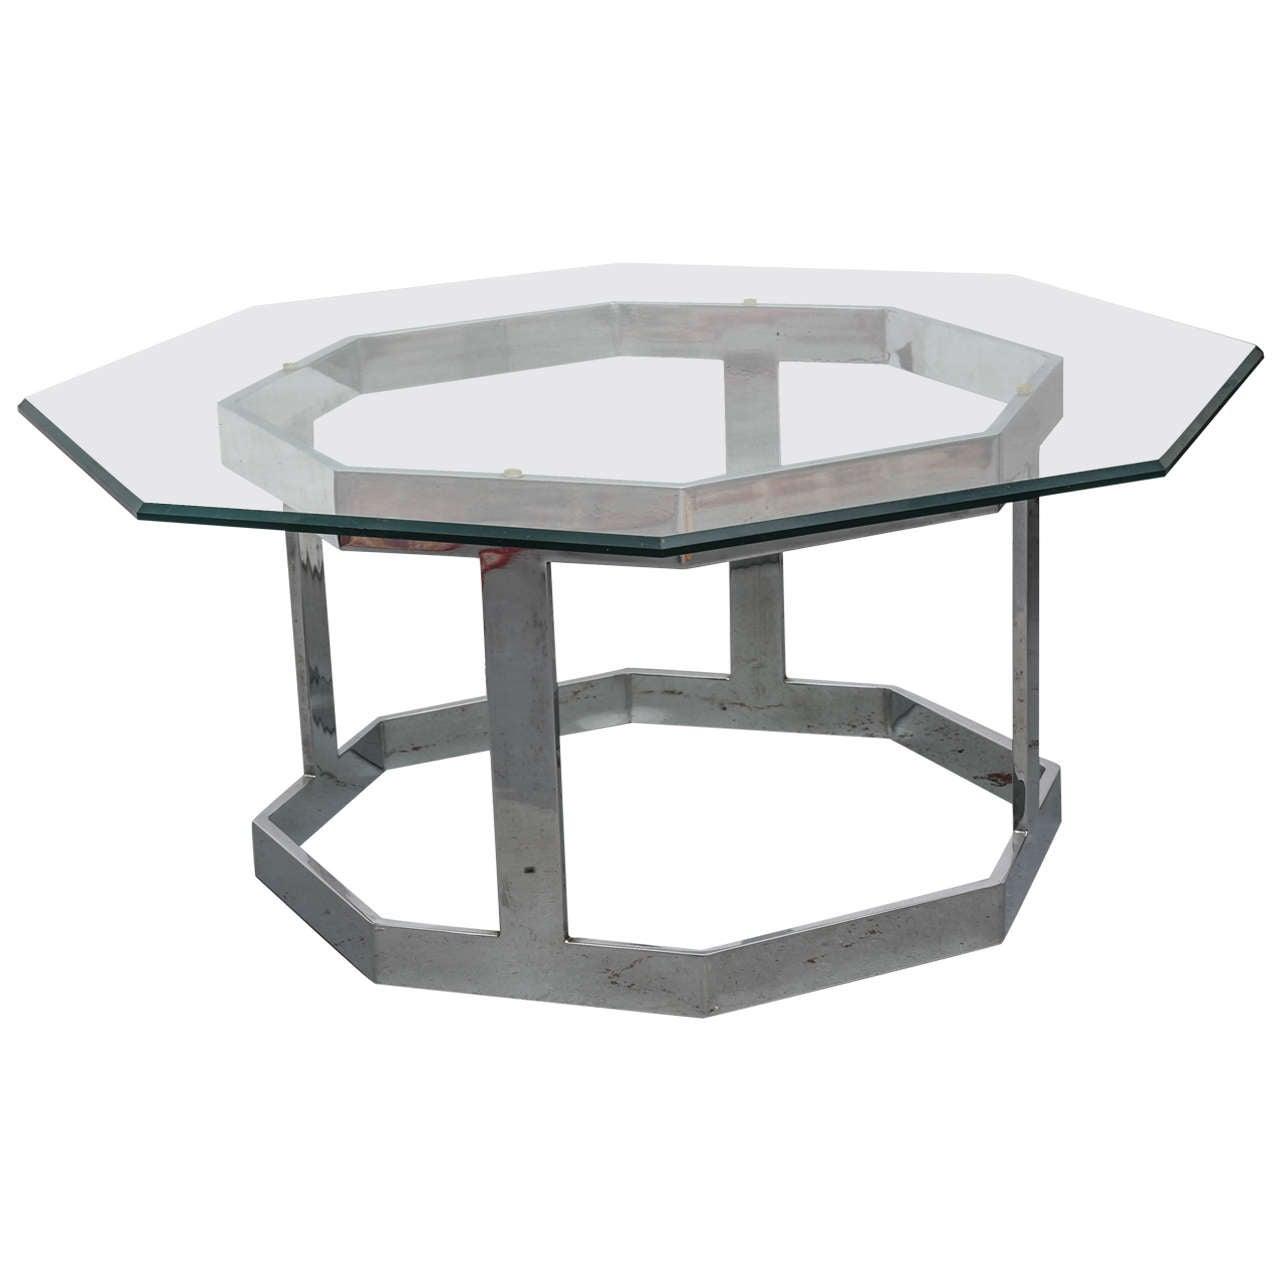 Small octagonal milo baughman chrome and glass coffee for Small glass and chrome coffee table